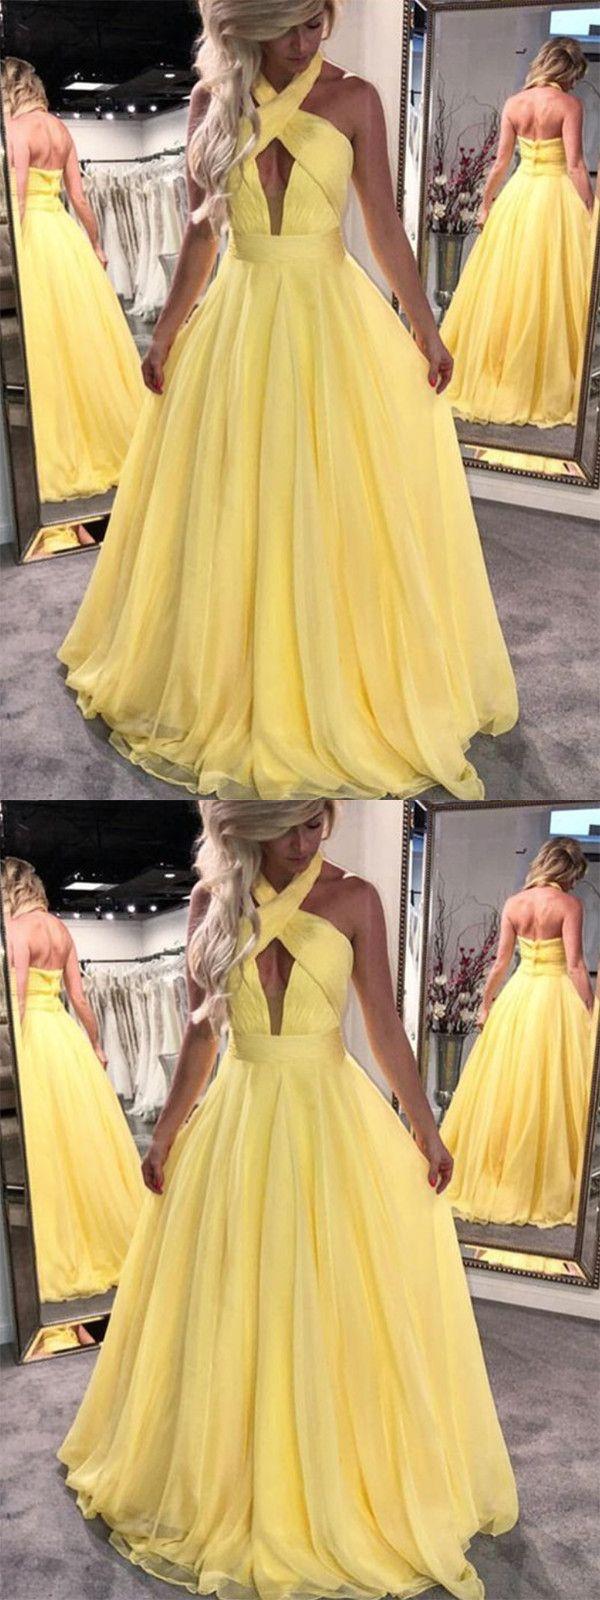 best ball gowns images on pinterest alternative ball dresses